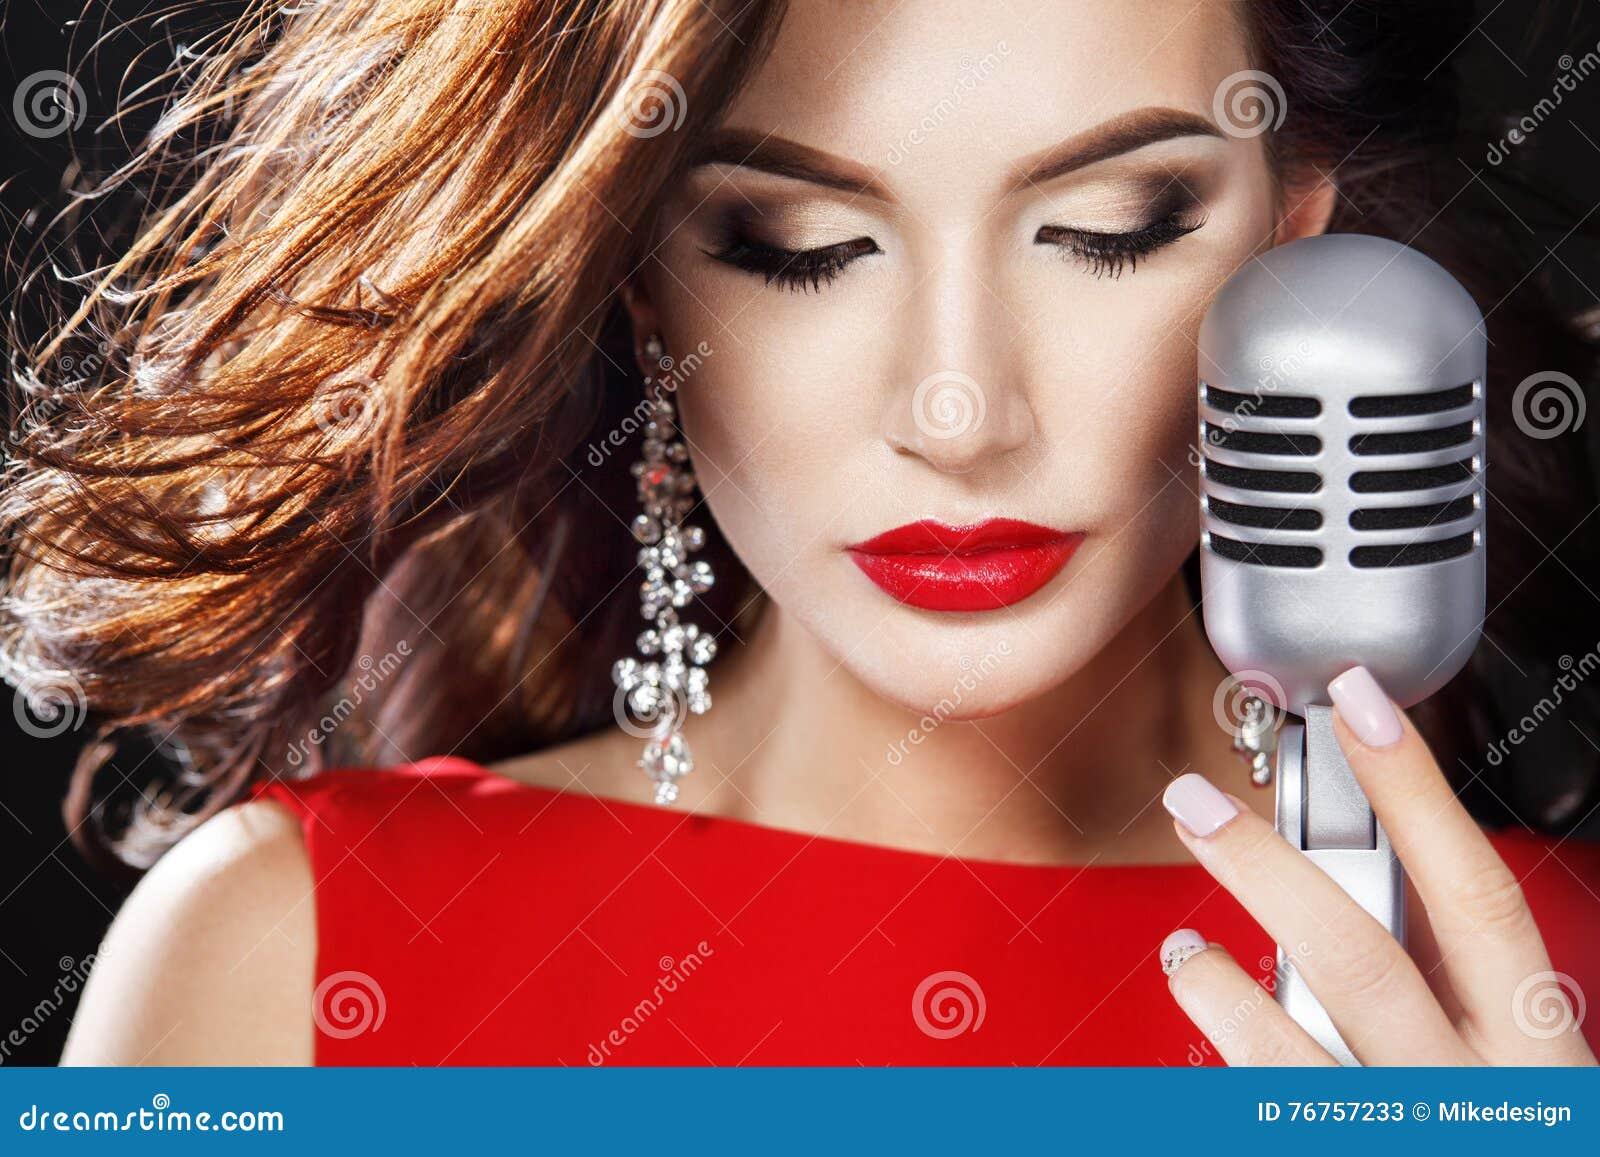 World's Top 10 Famous, Hottest & Best Female Pop Singers ...